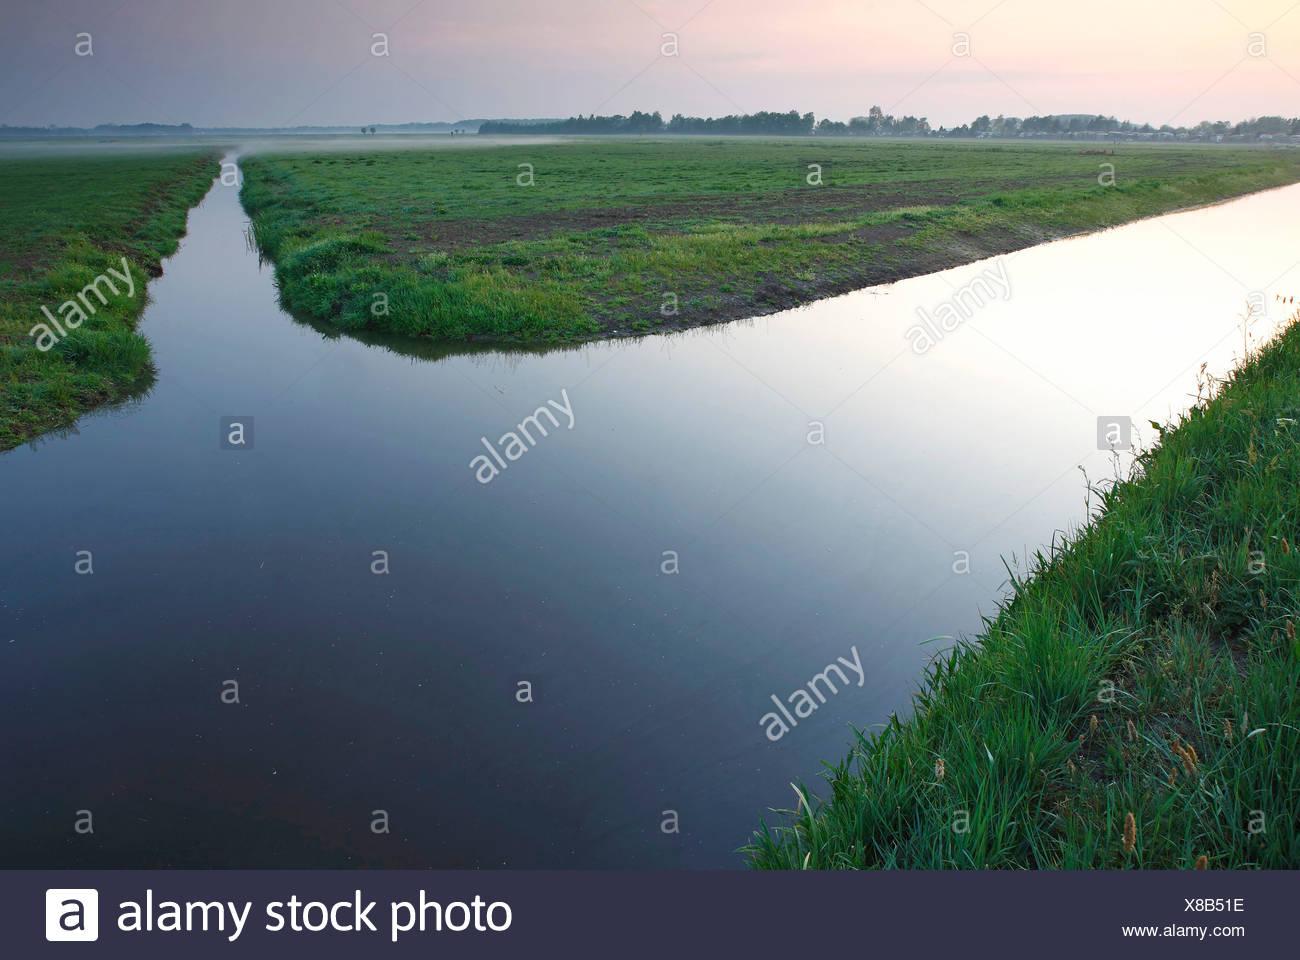 polder landscape, Netherlands, Gelderland, Nijkerk - Stock Image